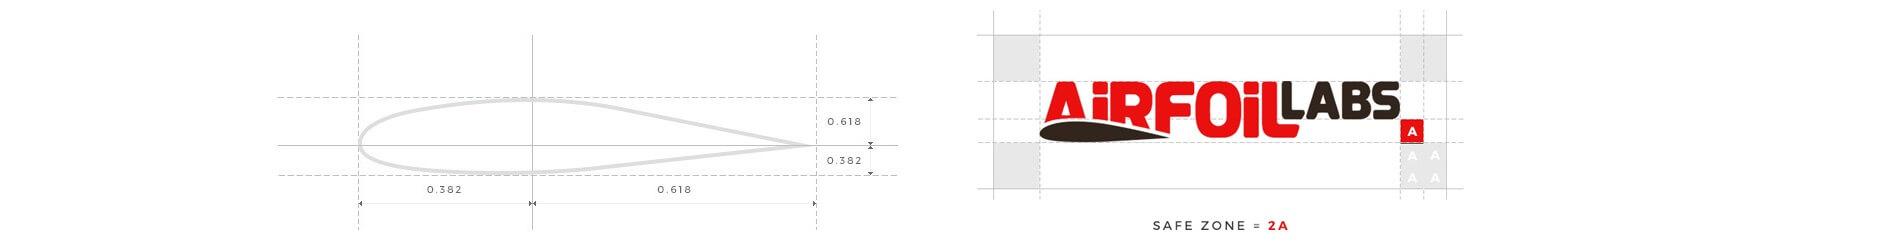 Airfoillabs C172SP 00 bendix mn 20e wiring diagram diagram wiring diagrams for diy car  at aneh.co